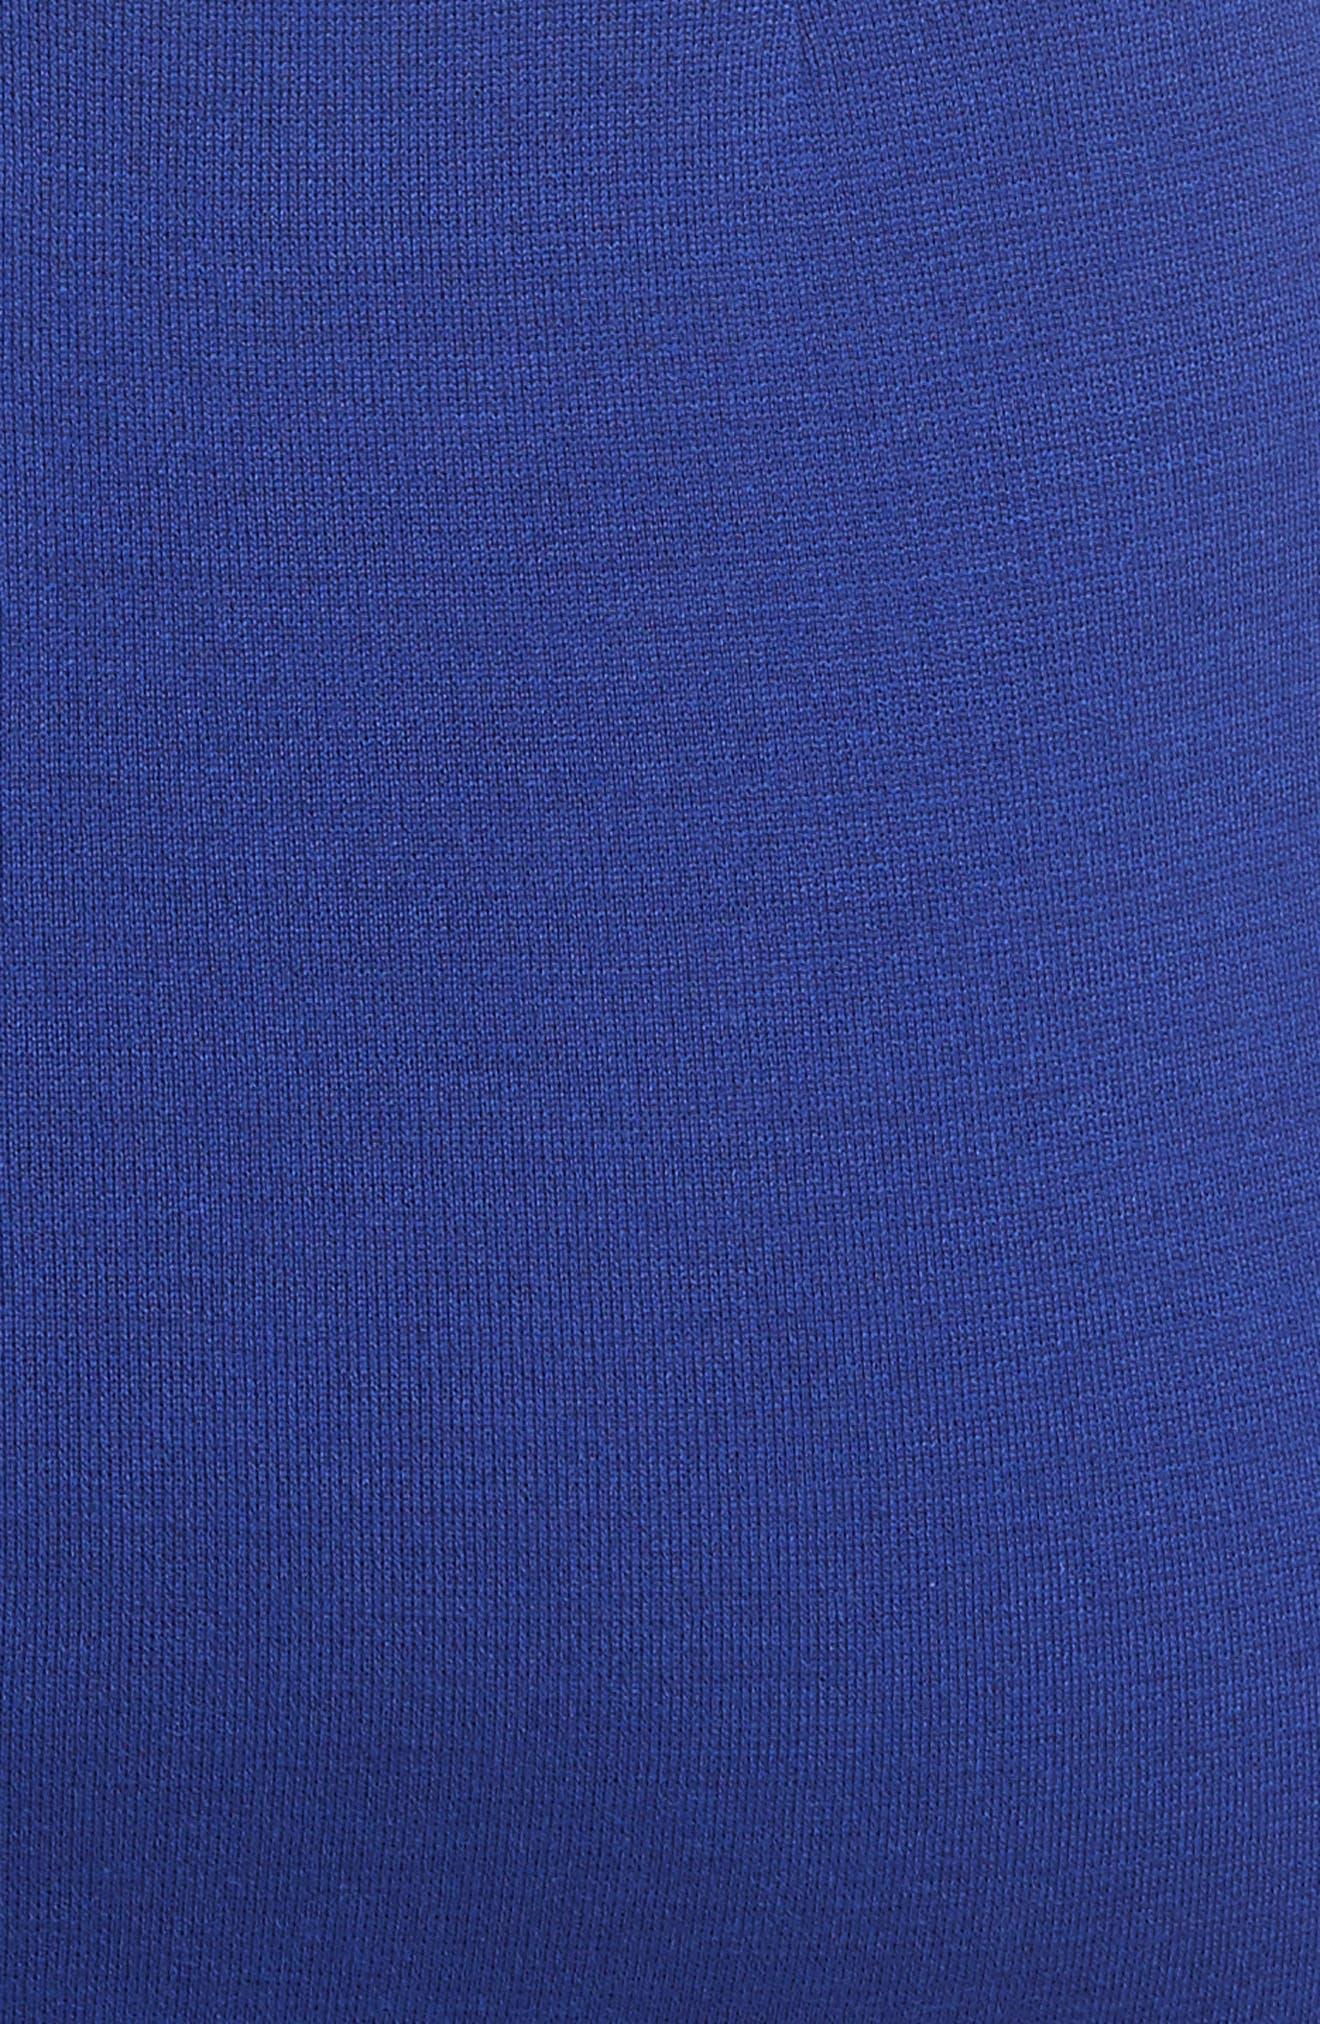 Milano Knit Sheath Dress,                             Alternate thumbnail 5, color,                             430